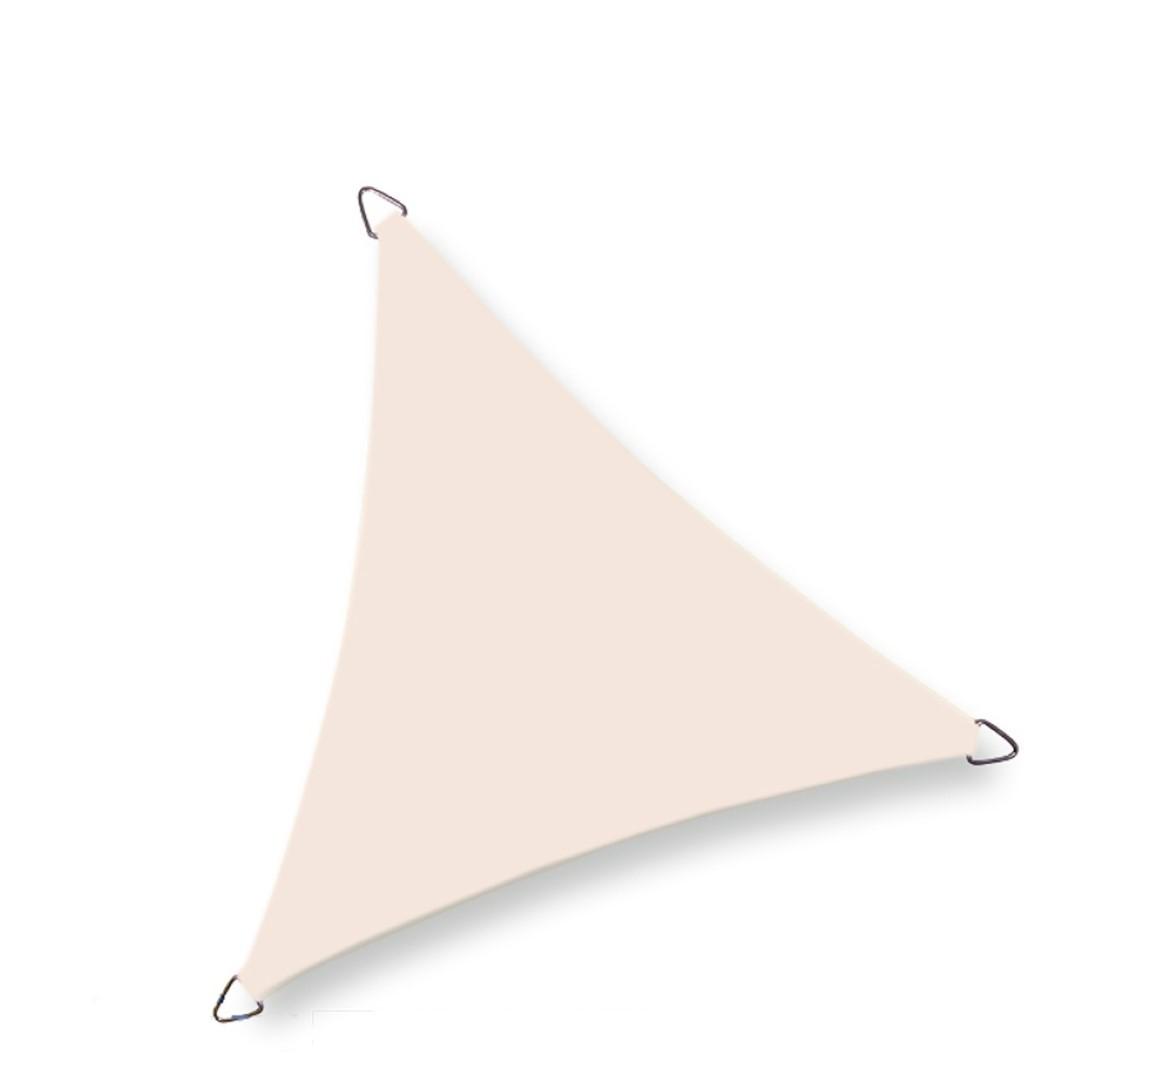 Driehoek 4,0 x 4,0 x 4,0m, Cream